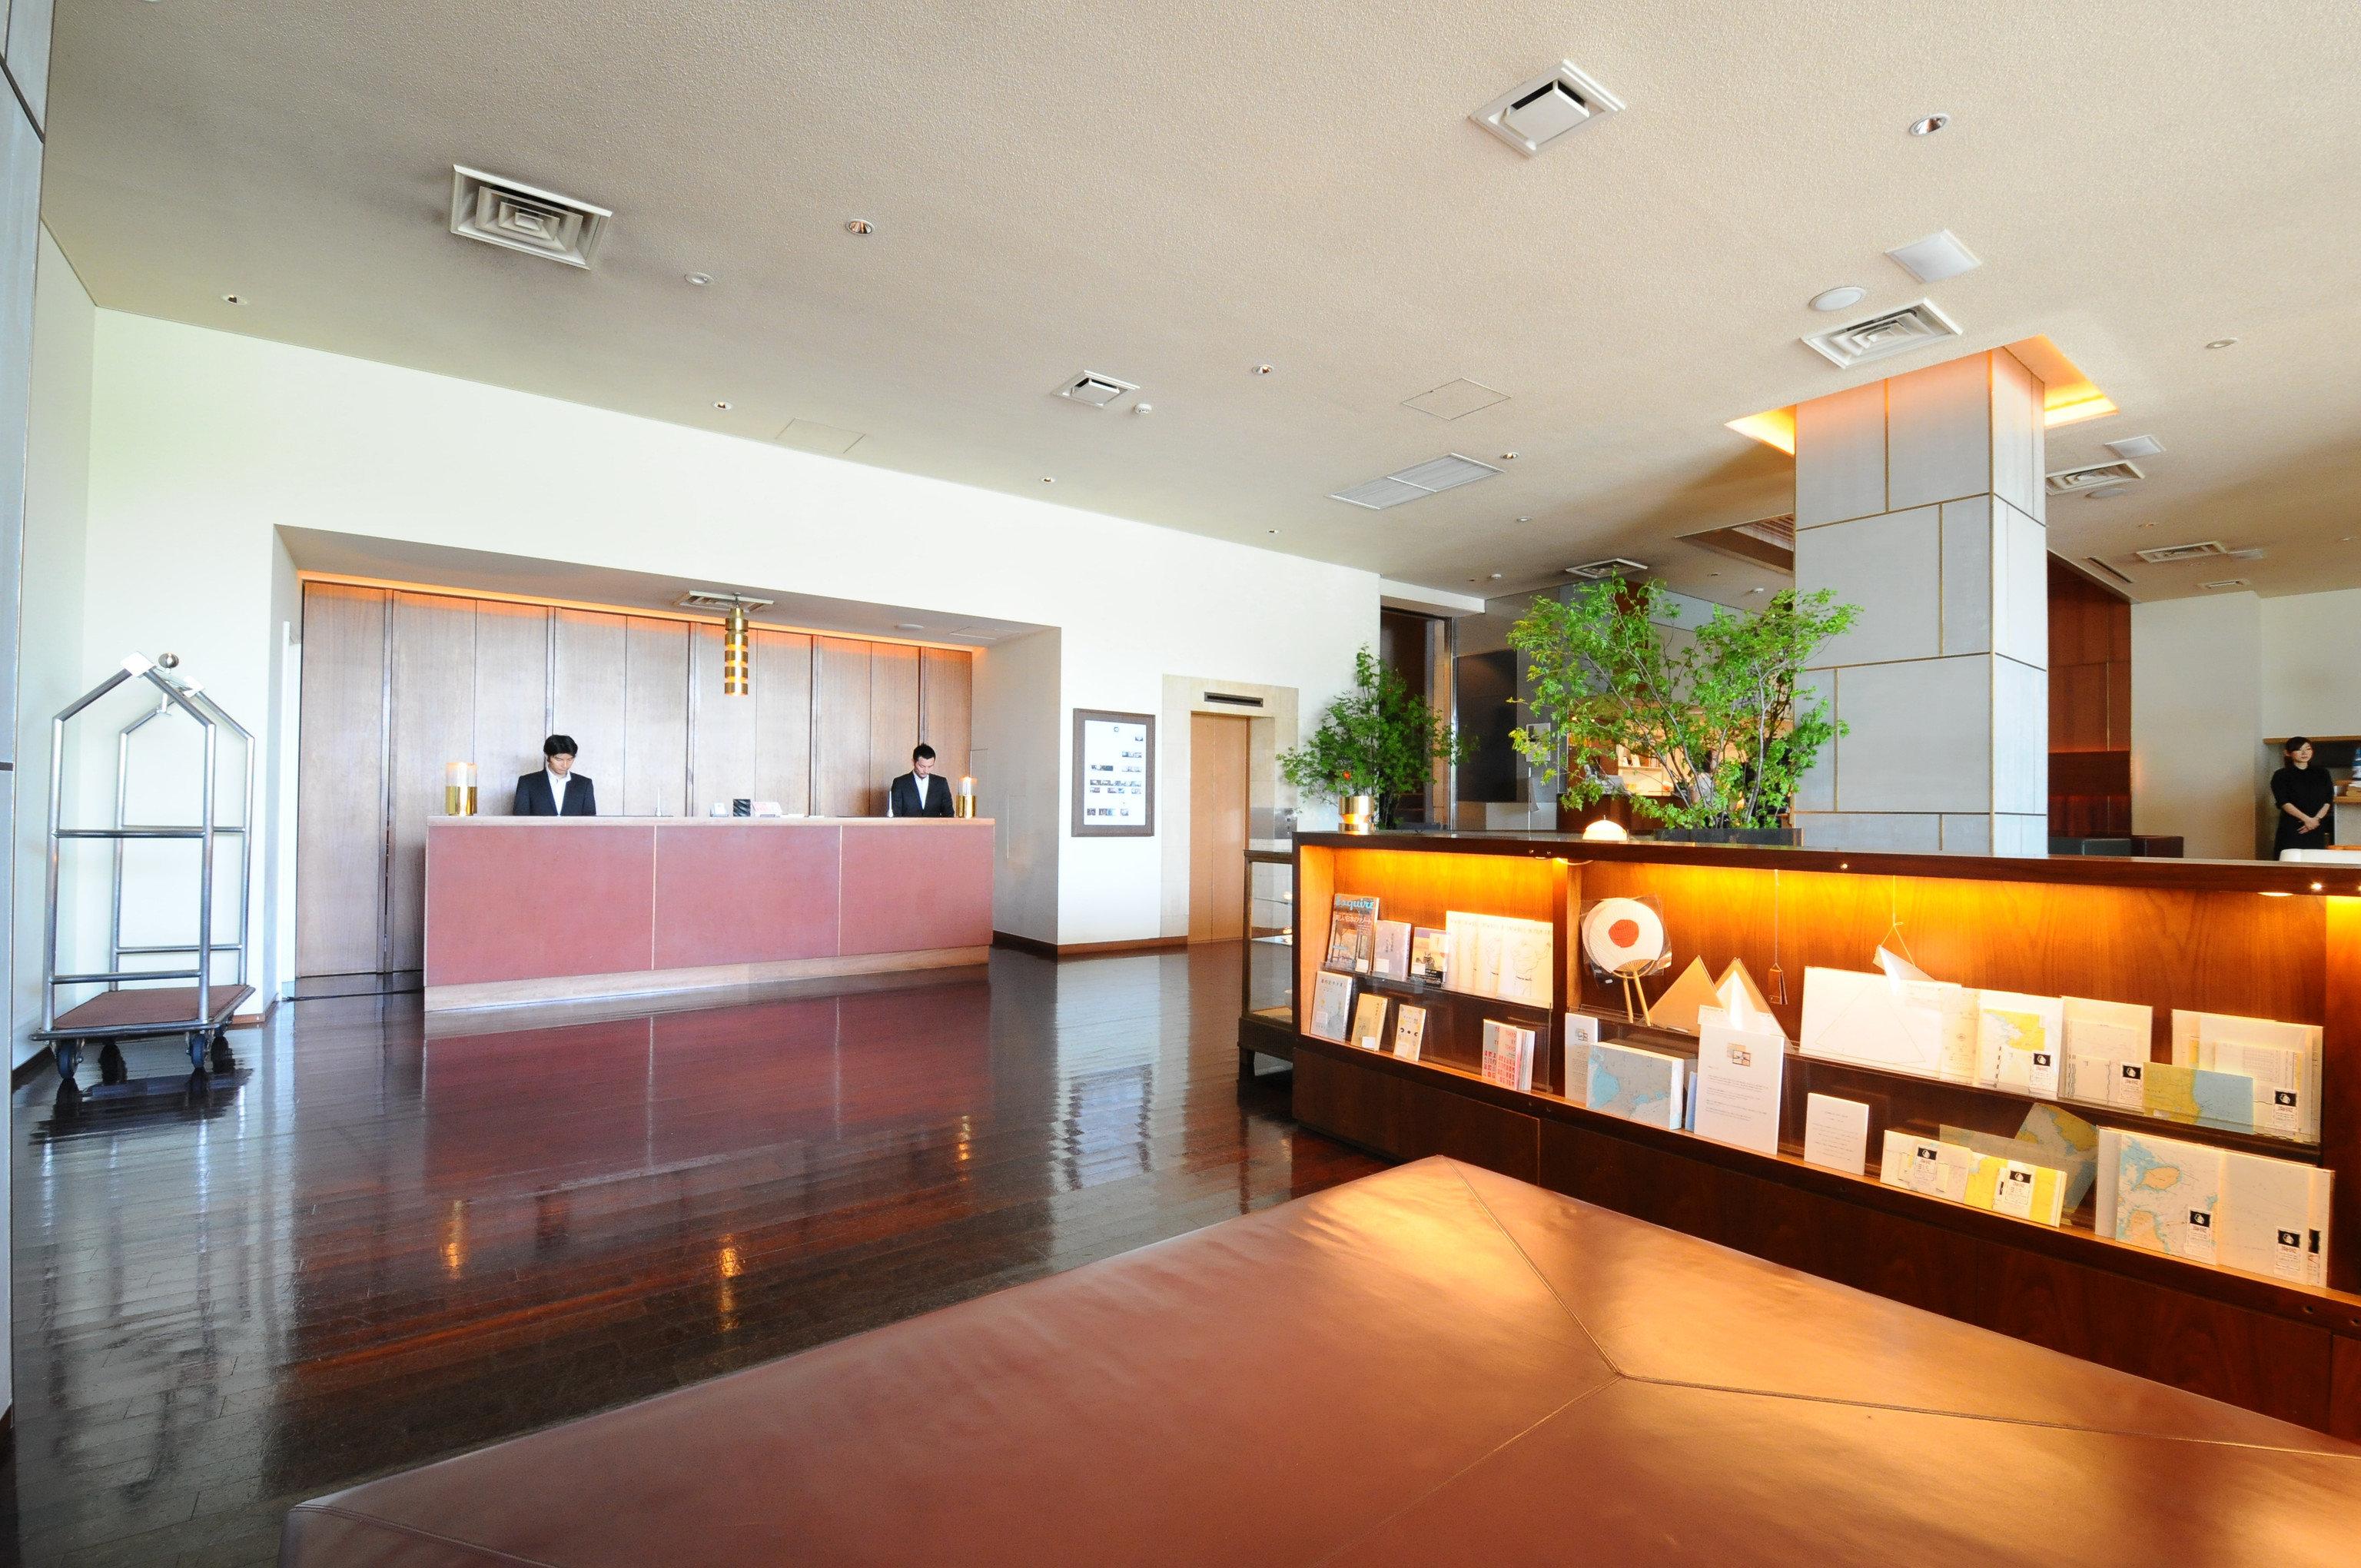 Hotels Japan Tokyo floor indoor wall ceiling Lobby property room Living interior design estate real estate condominium home Design living room furniture wood